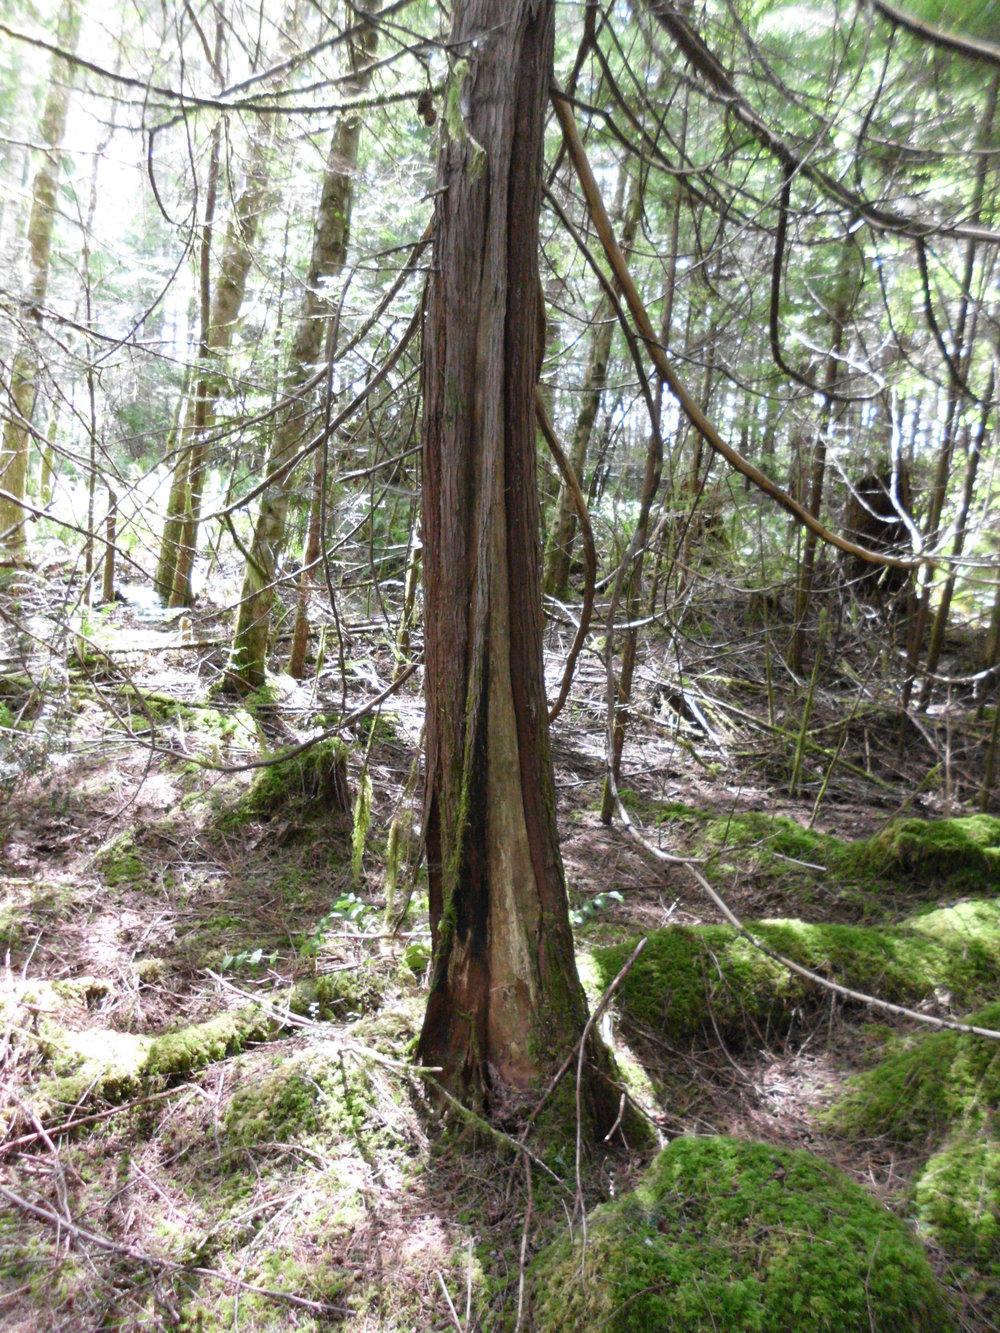 Bear damage on cedar tree